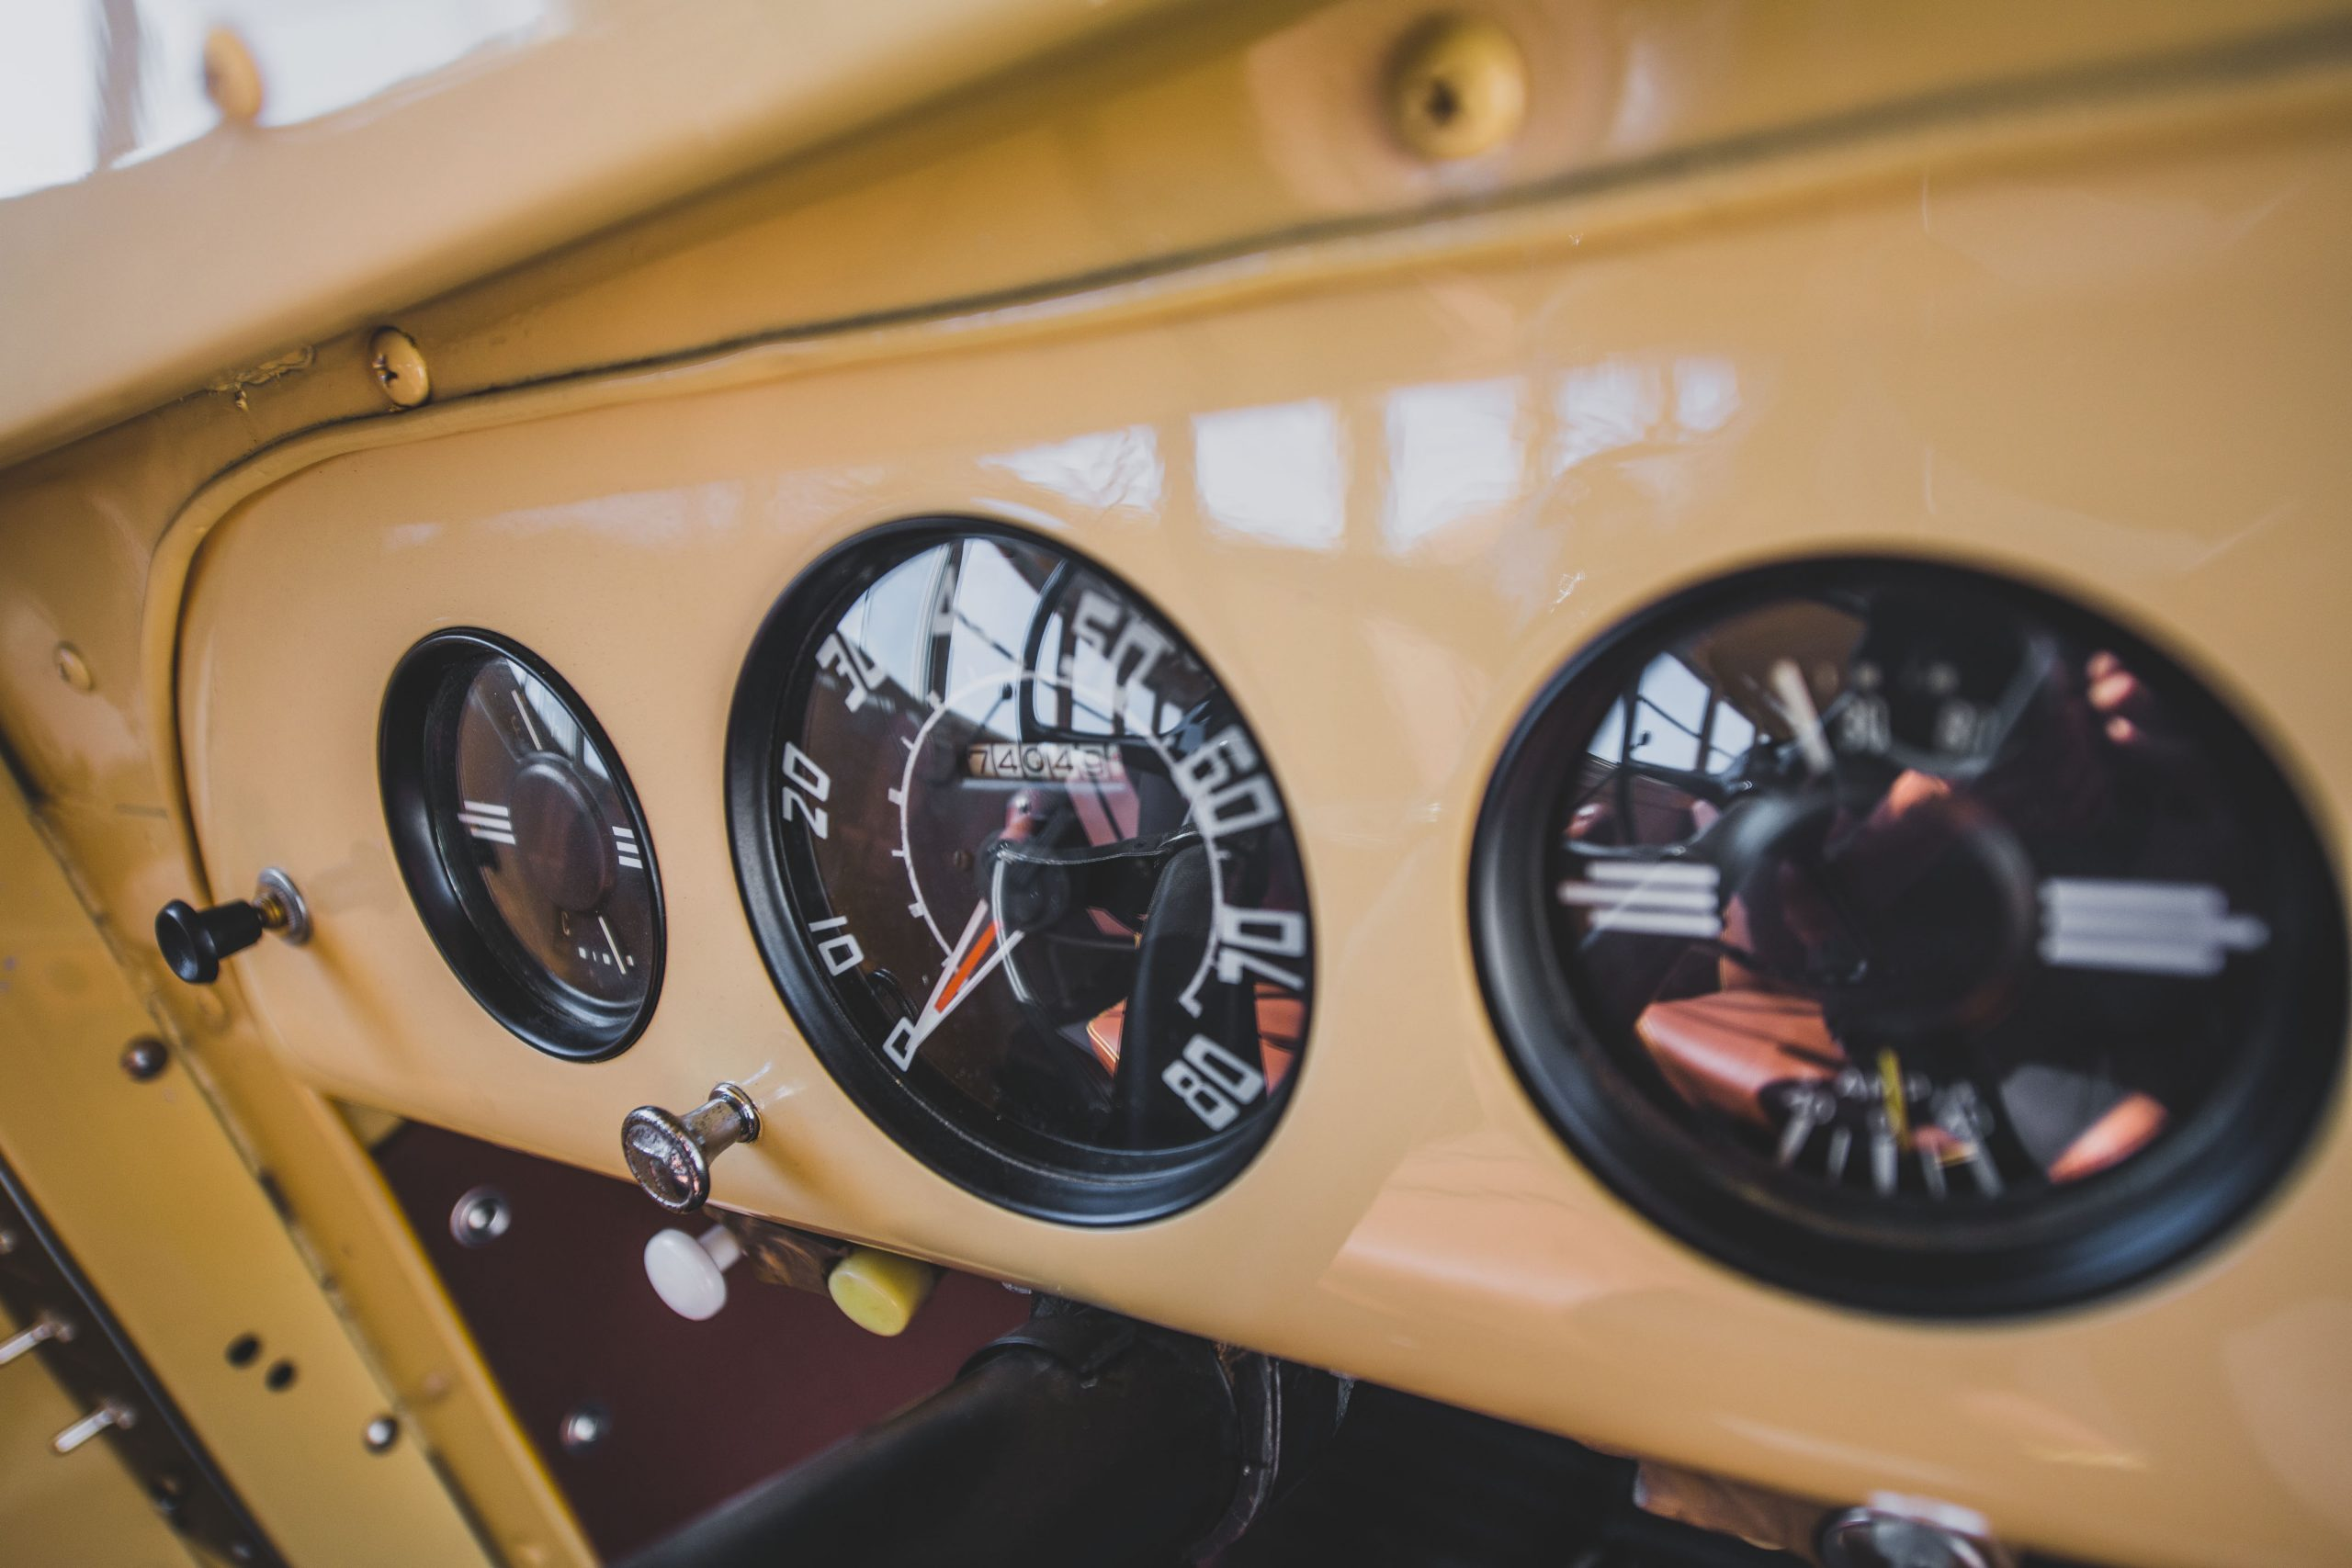 1949-Nash-Model-3248-School-Bus interior gauges